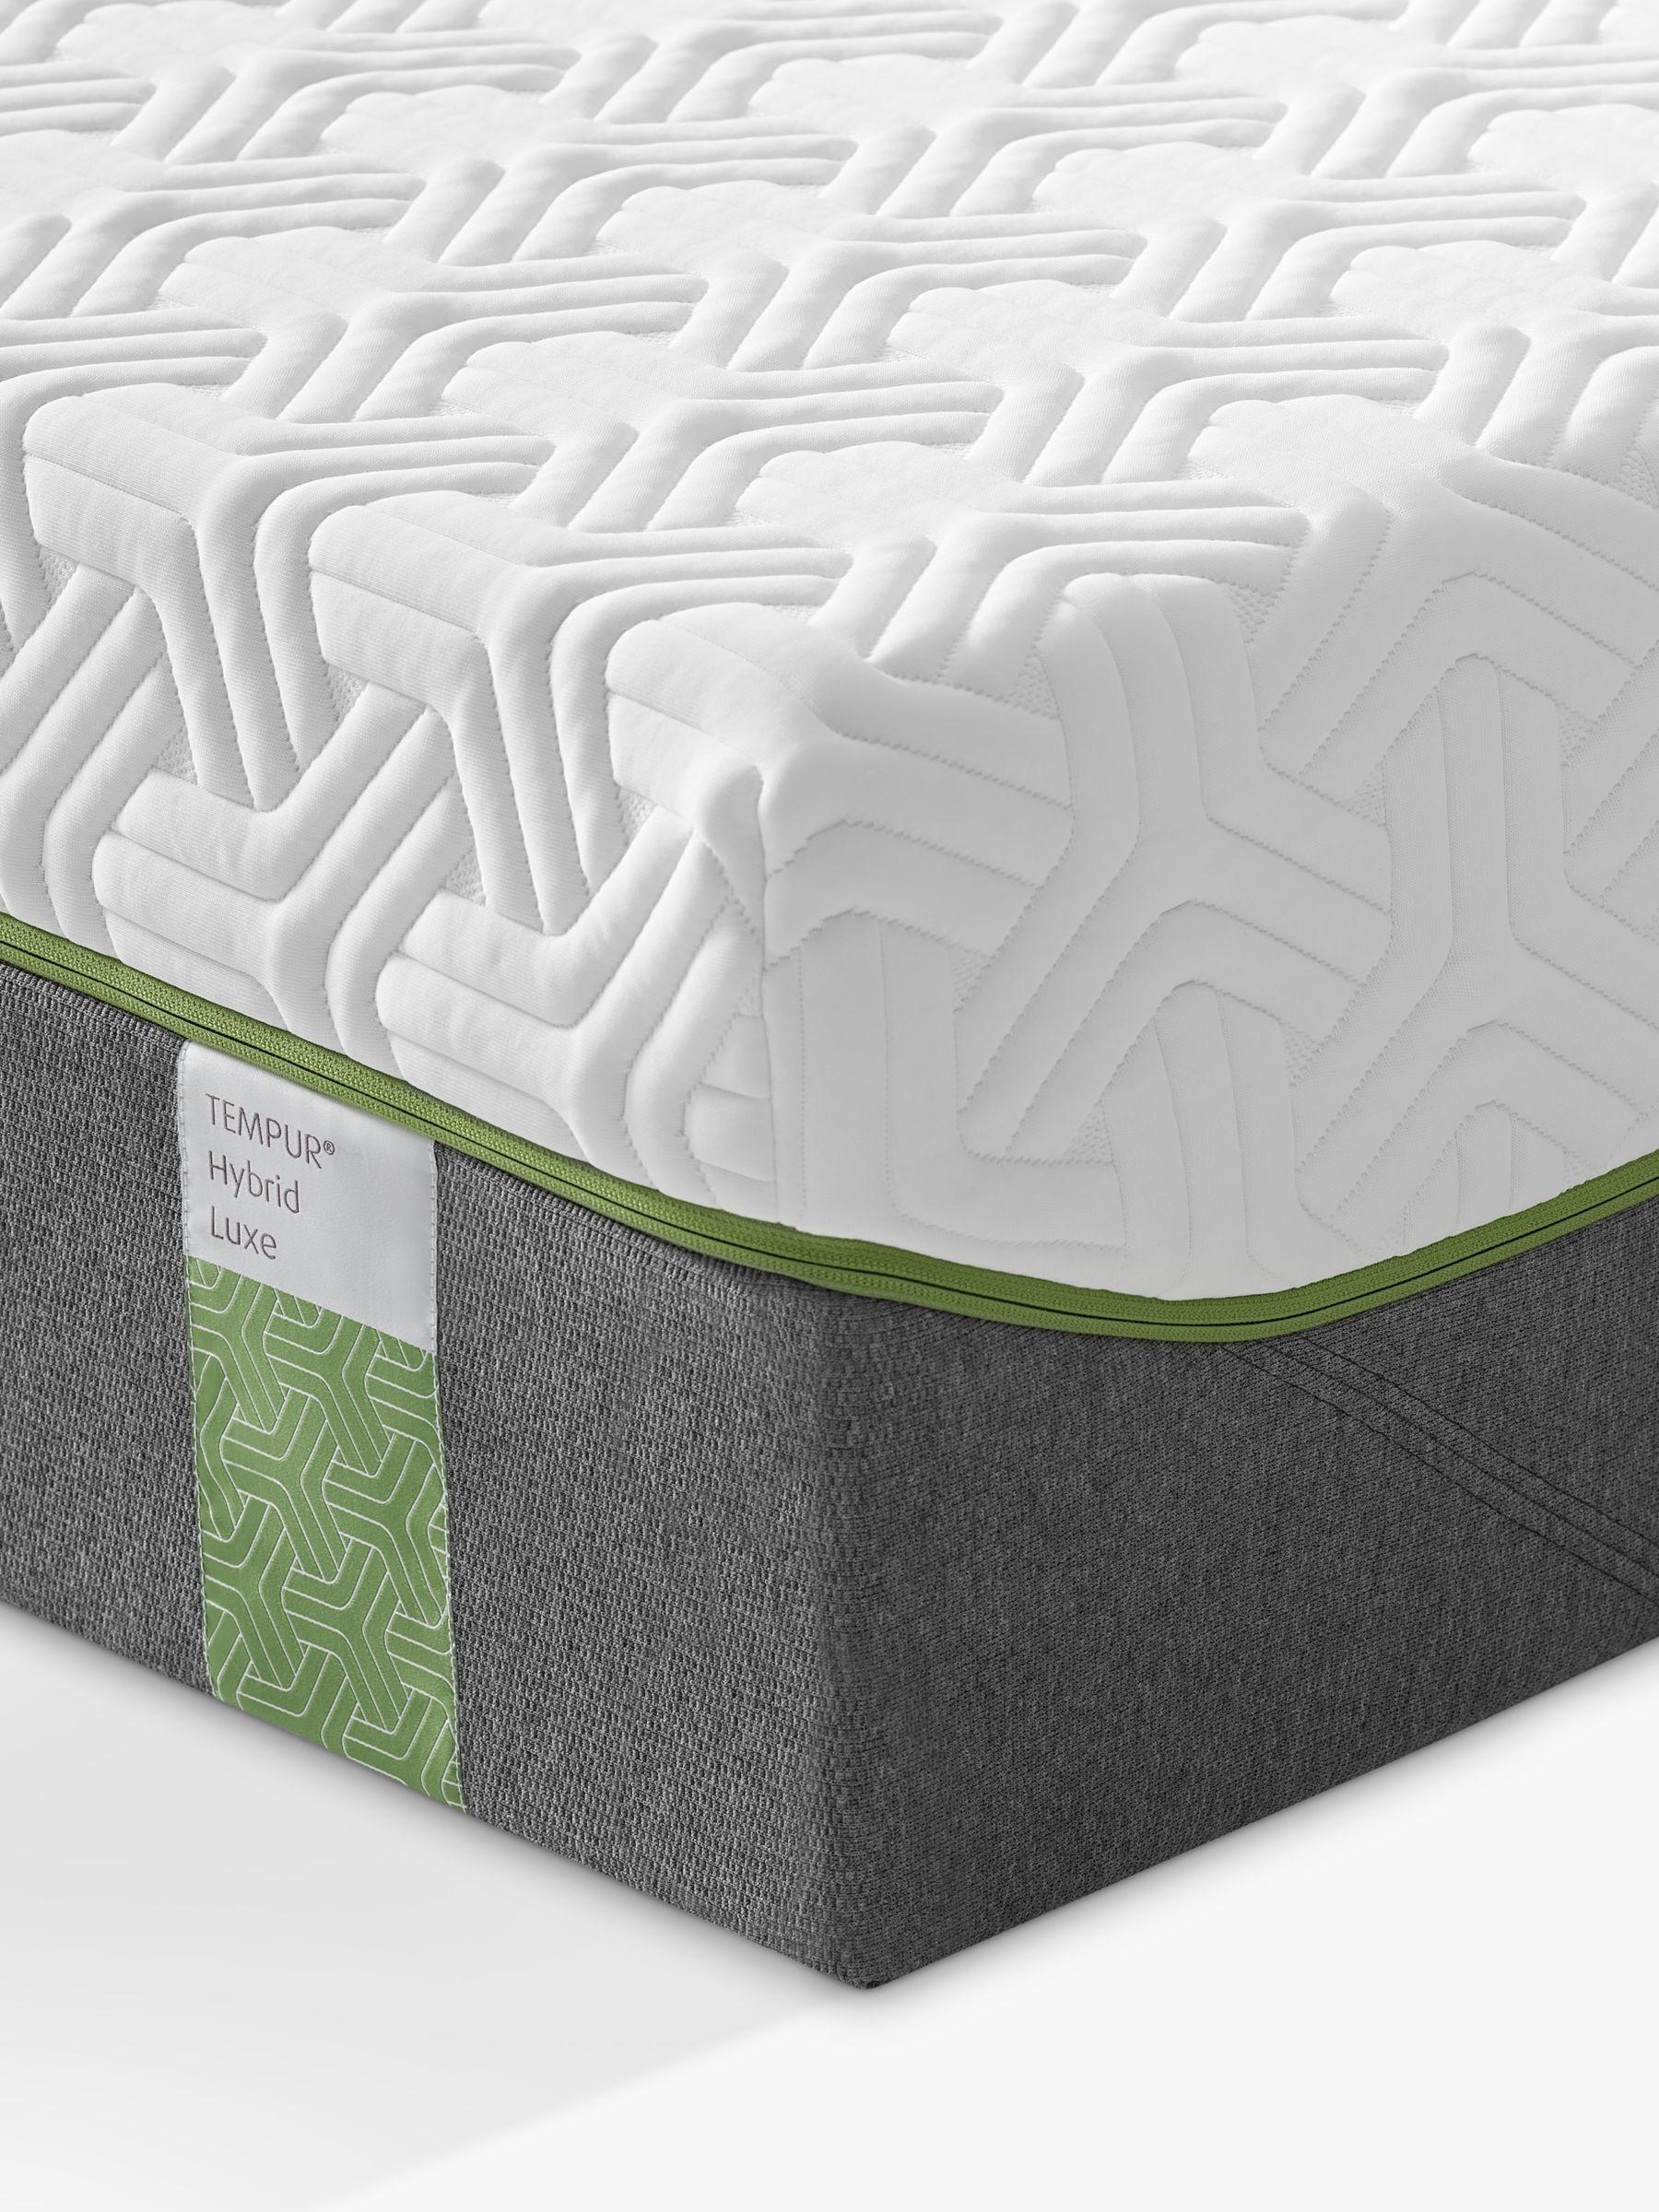 Tempur Tempur Hybrid Luxe Pocket Spring Memory Foam Mattress, Double